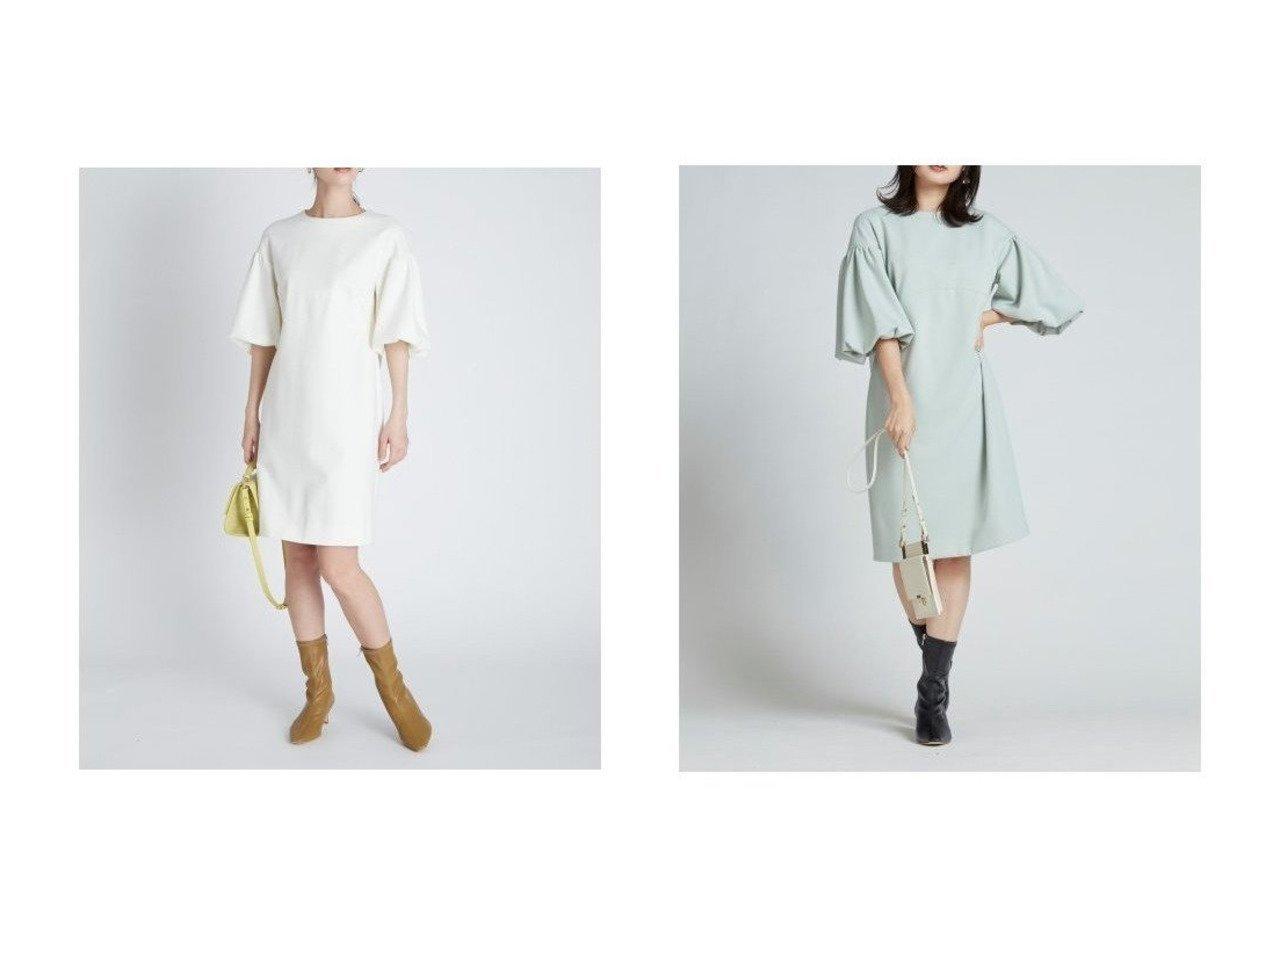 【CELFORD/セルフォード】のポンチコクーンワンピース 【ワンピース・ドレス】おすすめ!人気、トレンド・レディースファッションの通販 おすすめで人気の流行・トレンド、ファッションの通販商品 インテリア・家具・メンズファッション・キッズファッション・レディースファッション・服の通販 founy(ファニー) https://founy.com/ ファッション Fashion レディースファッション WOMEN ワンピース Dress 切替 シューズ シンプル ストレッチ スマート バランス バルーン フラット おすすめ Recommend  ID:crp329100000054615